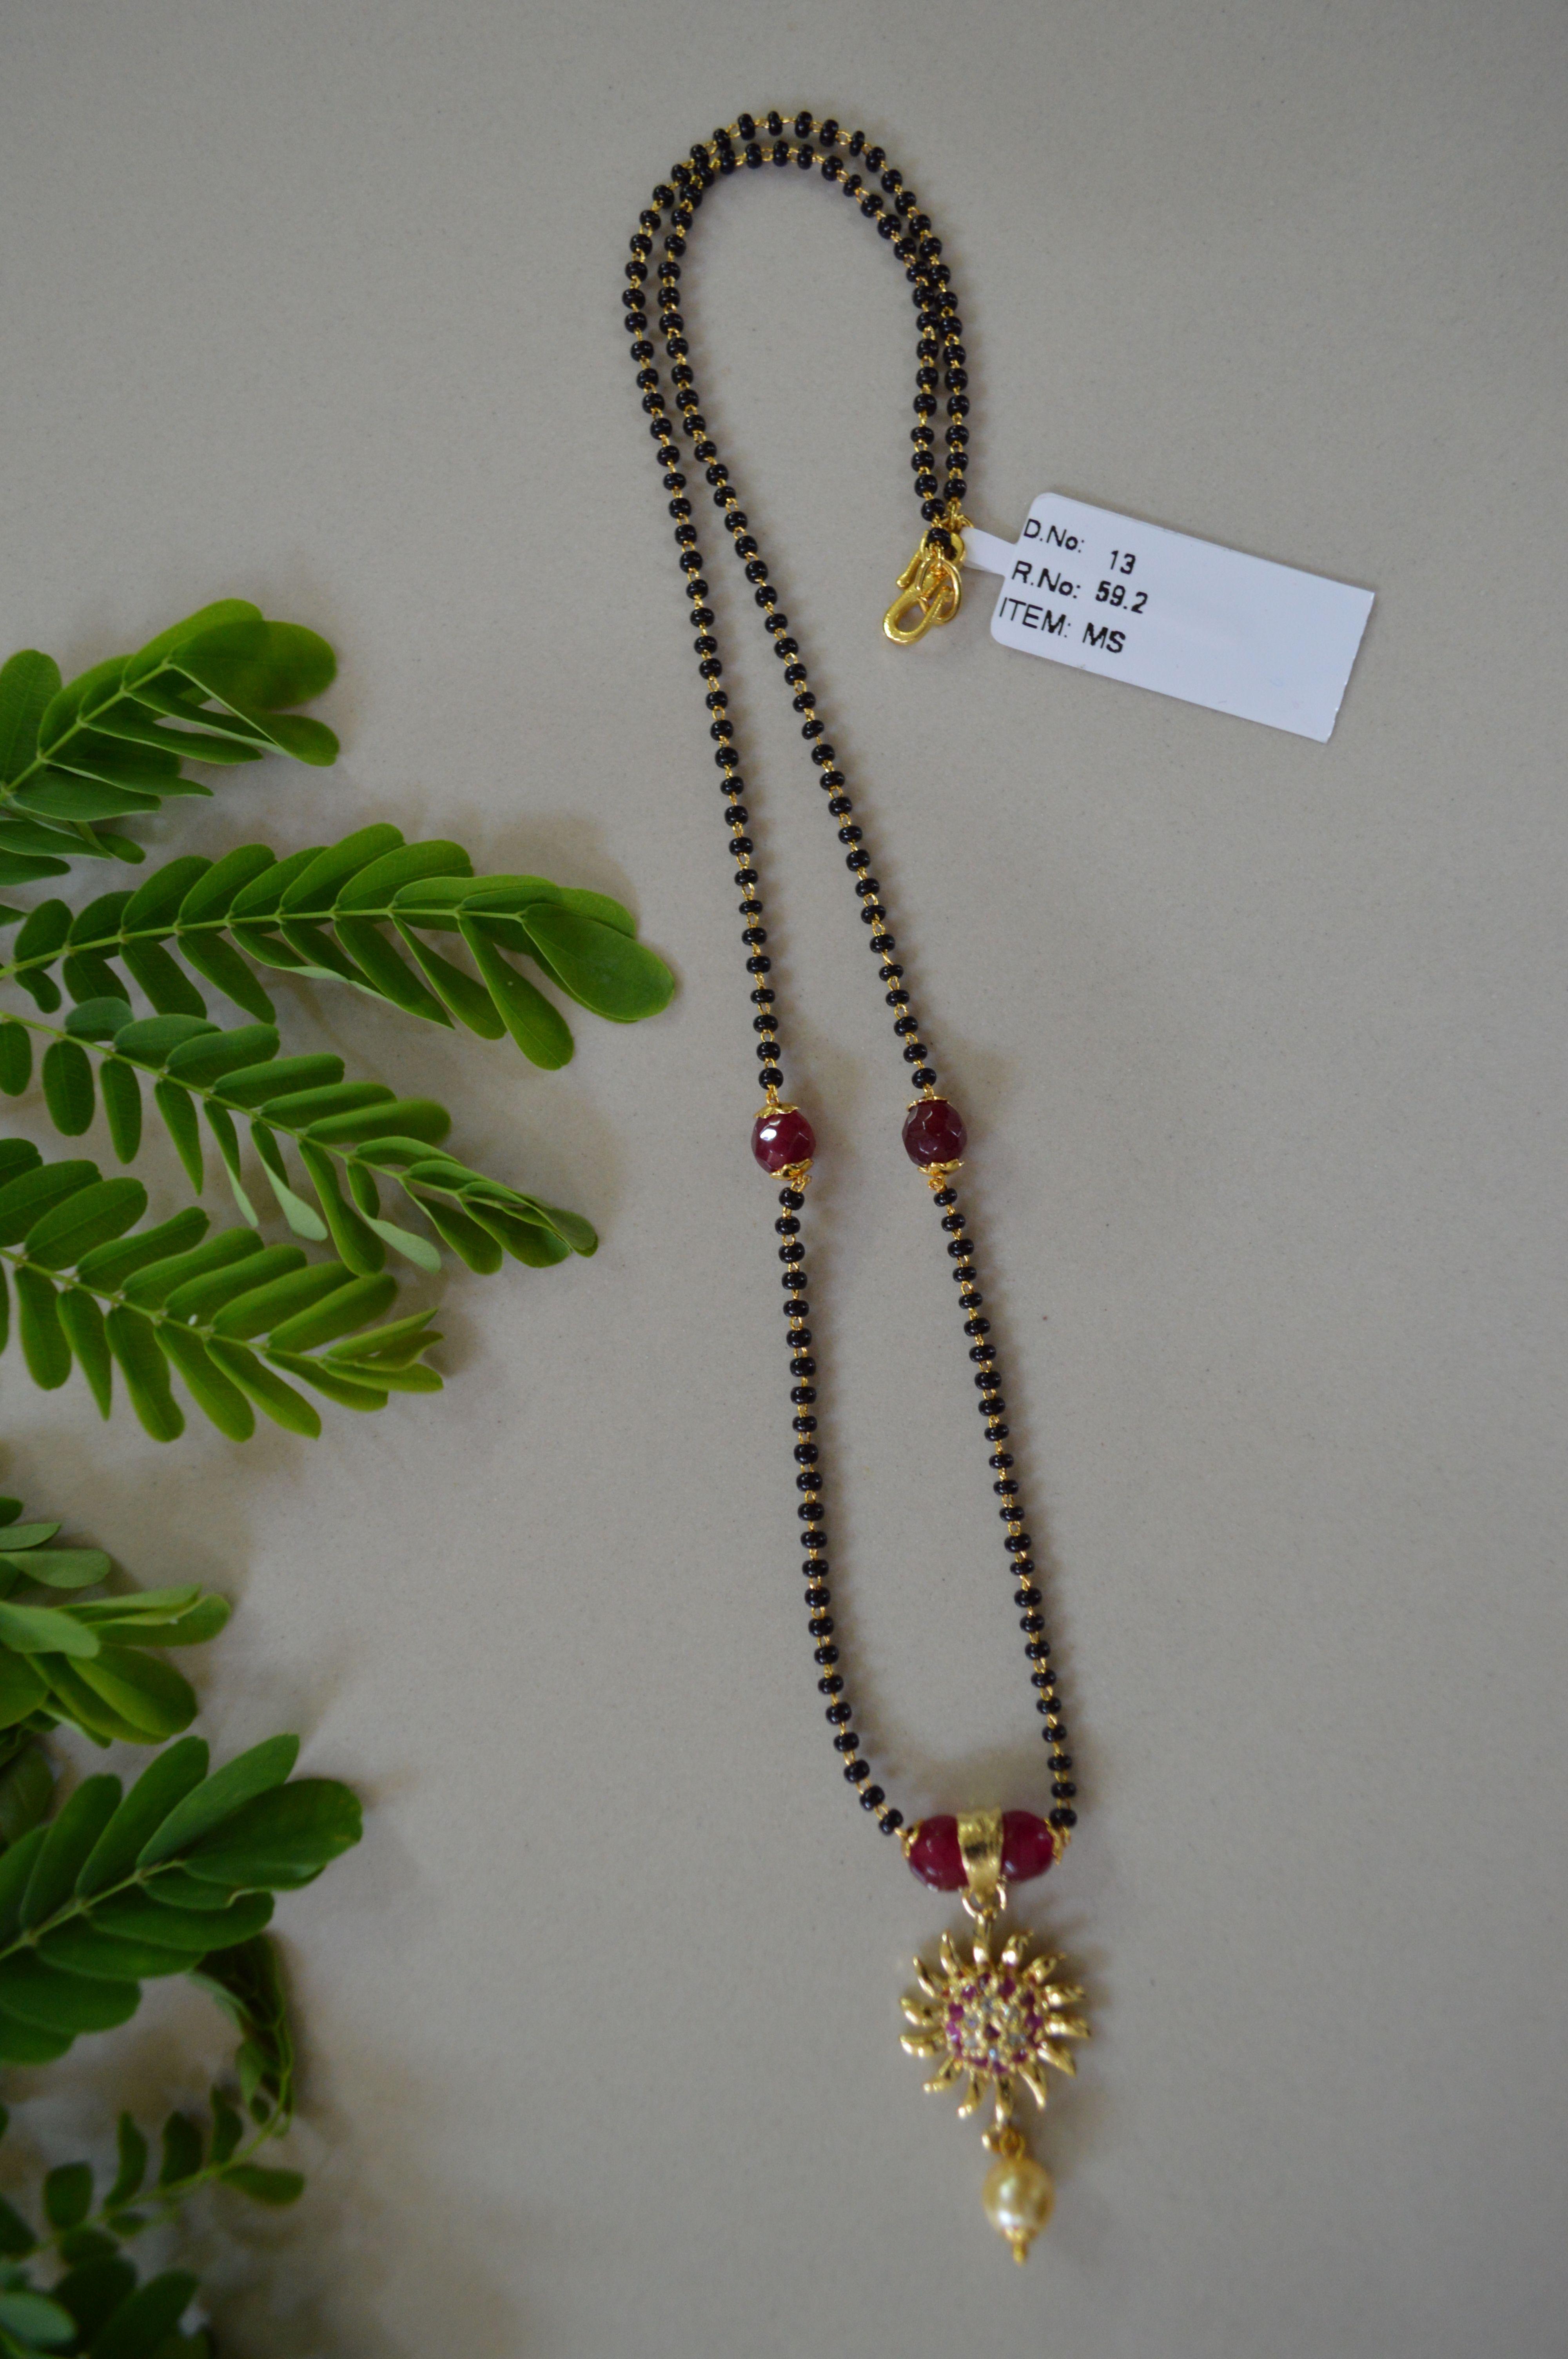 Black Beads 1 gm gold or imitation jewelry Chaitra Jewells